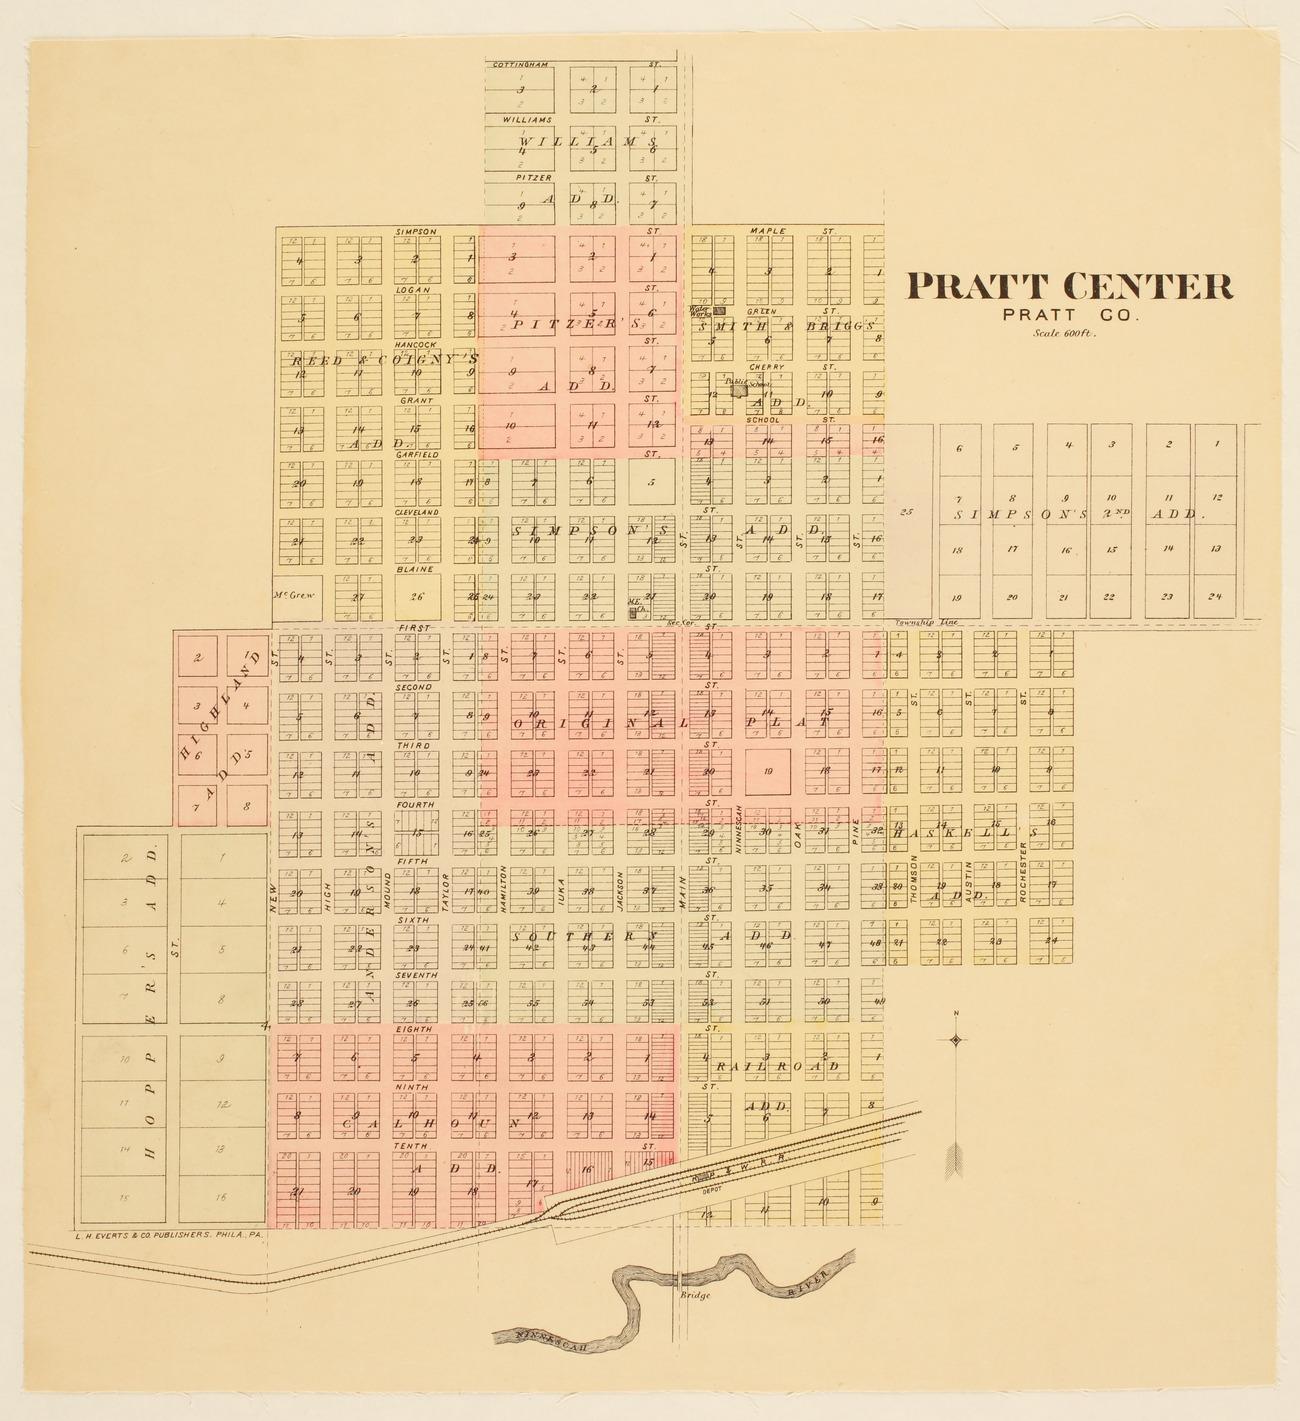 Pratt Center, Pratt County, Kansas